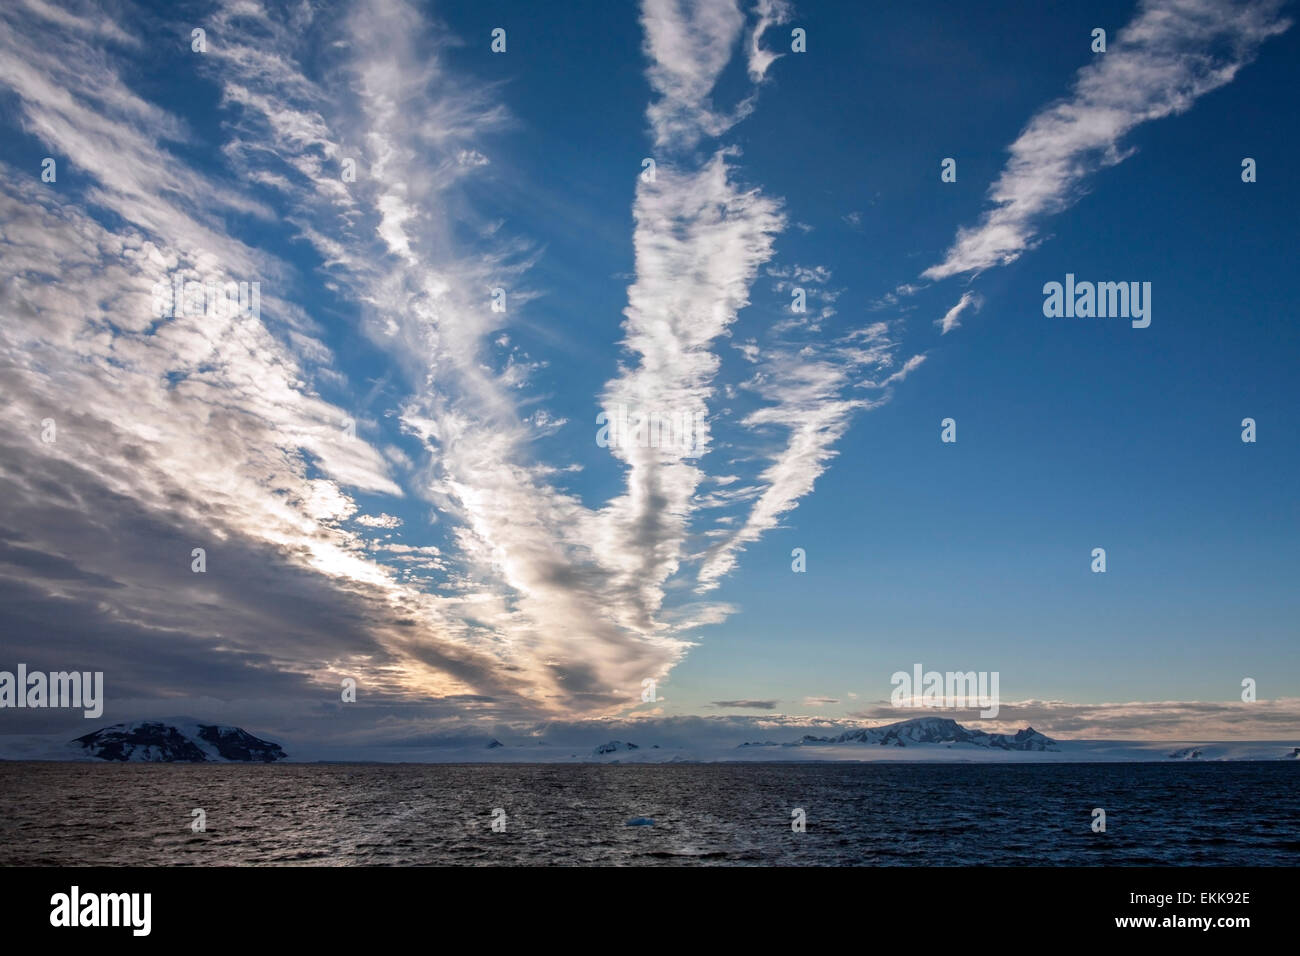 La mer de Weddell, près de la côte de la péninsule Antarctique dans l'Antarctique. Banque D'Images